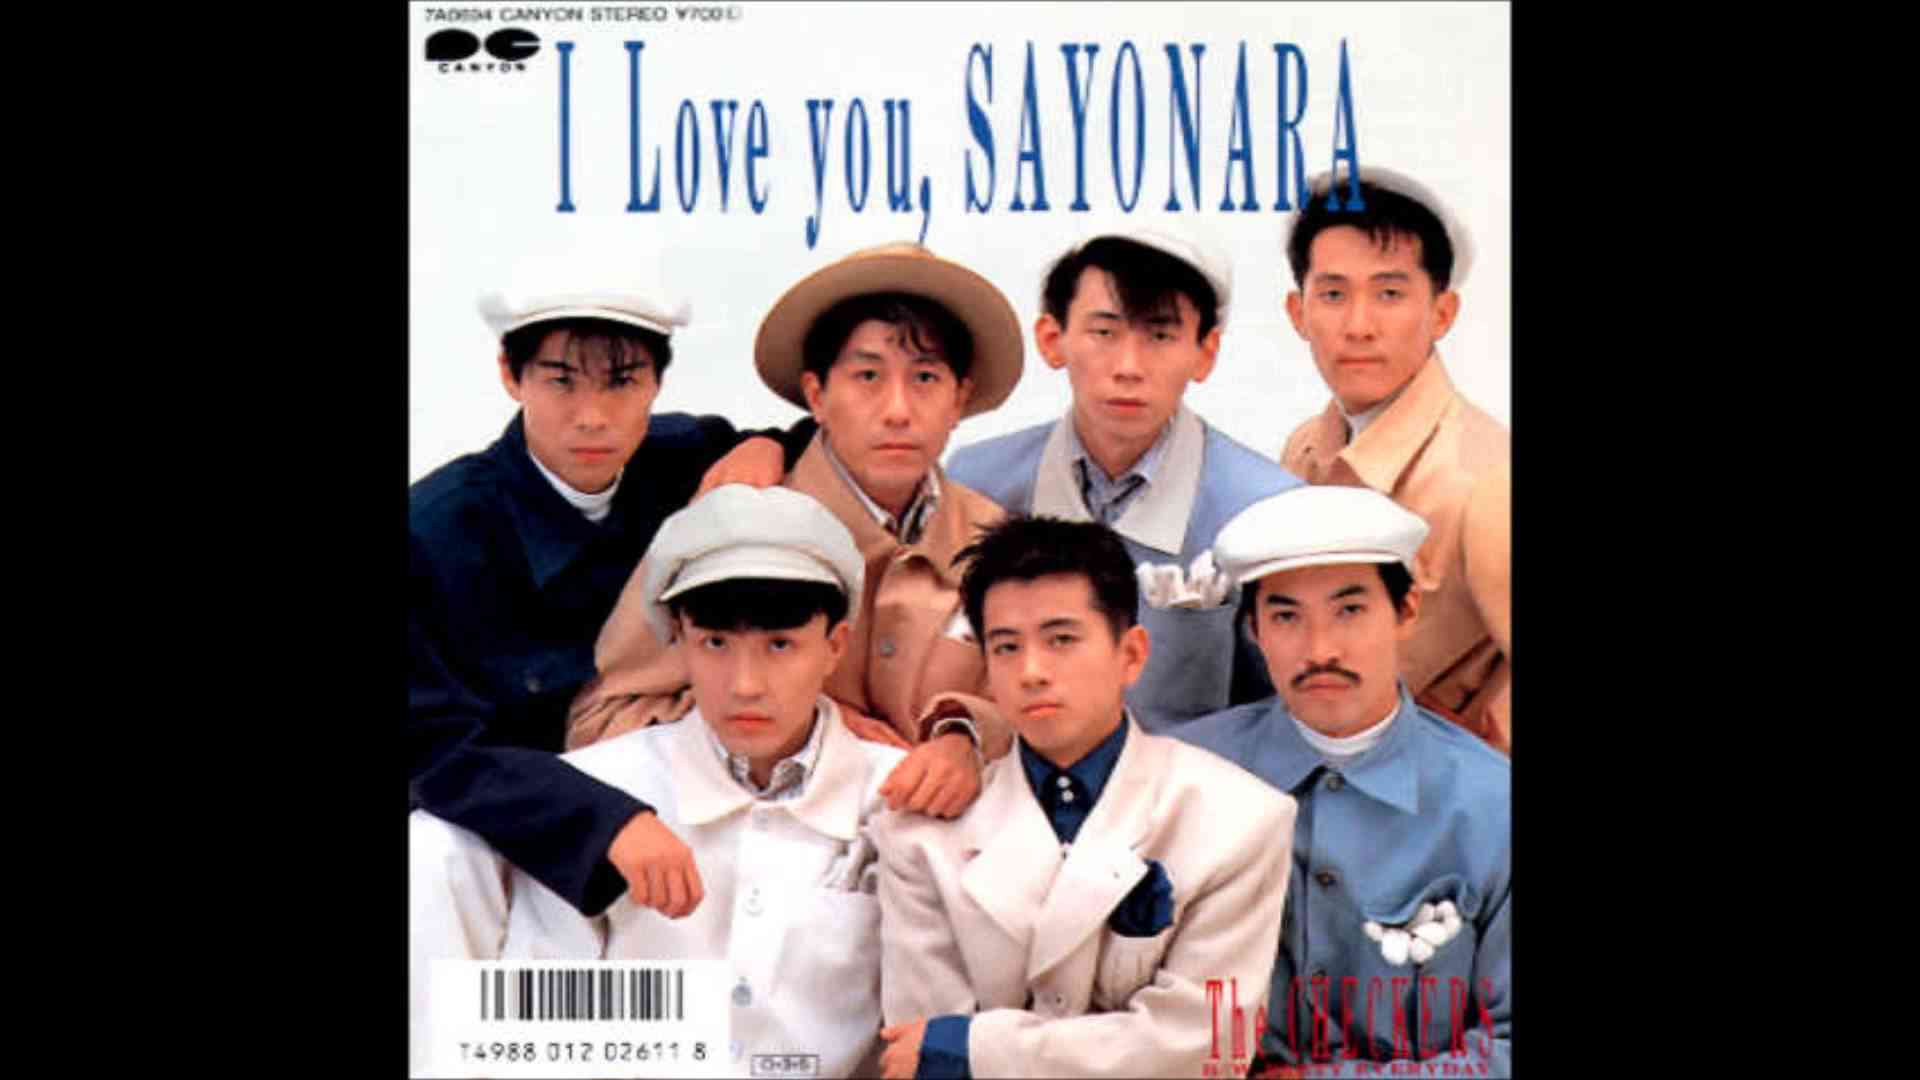 I Love you, SAYONARA - YouTube